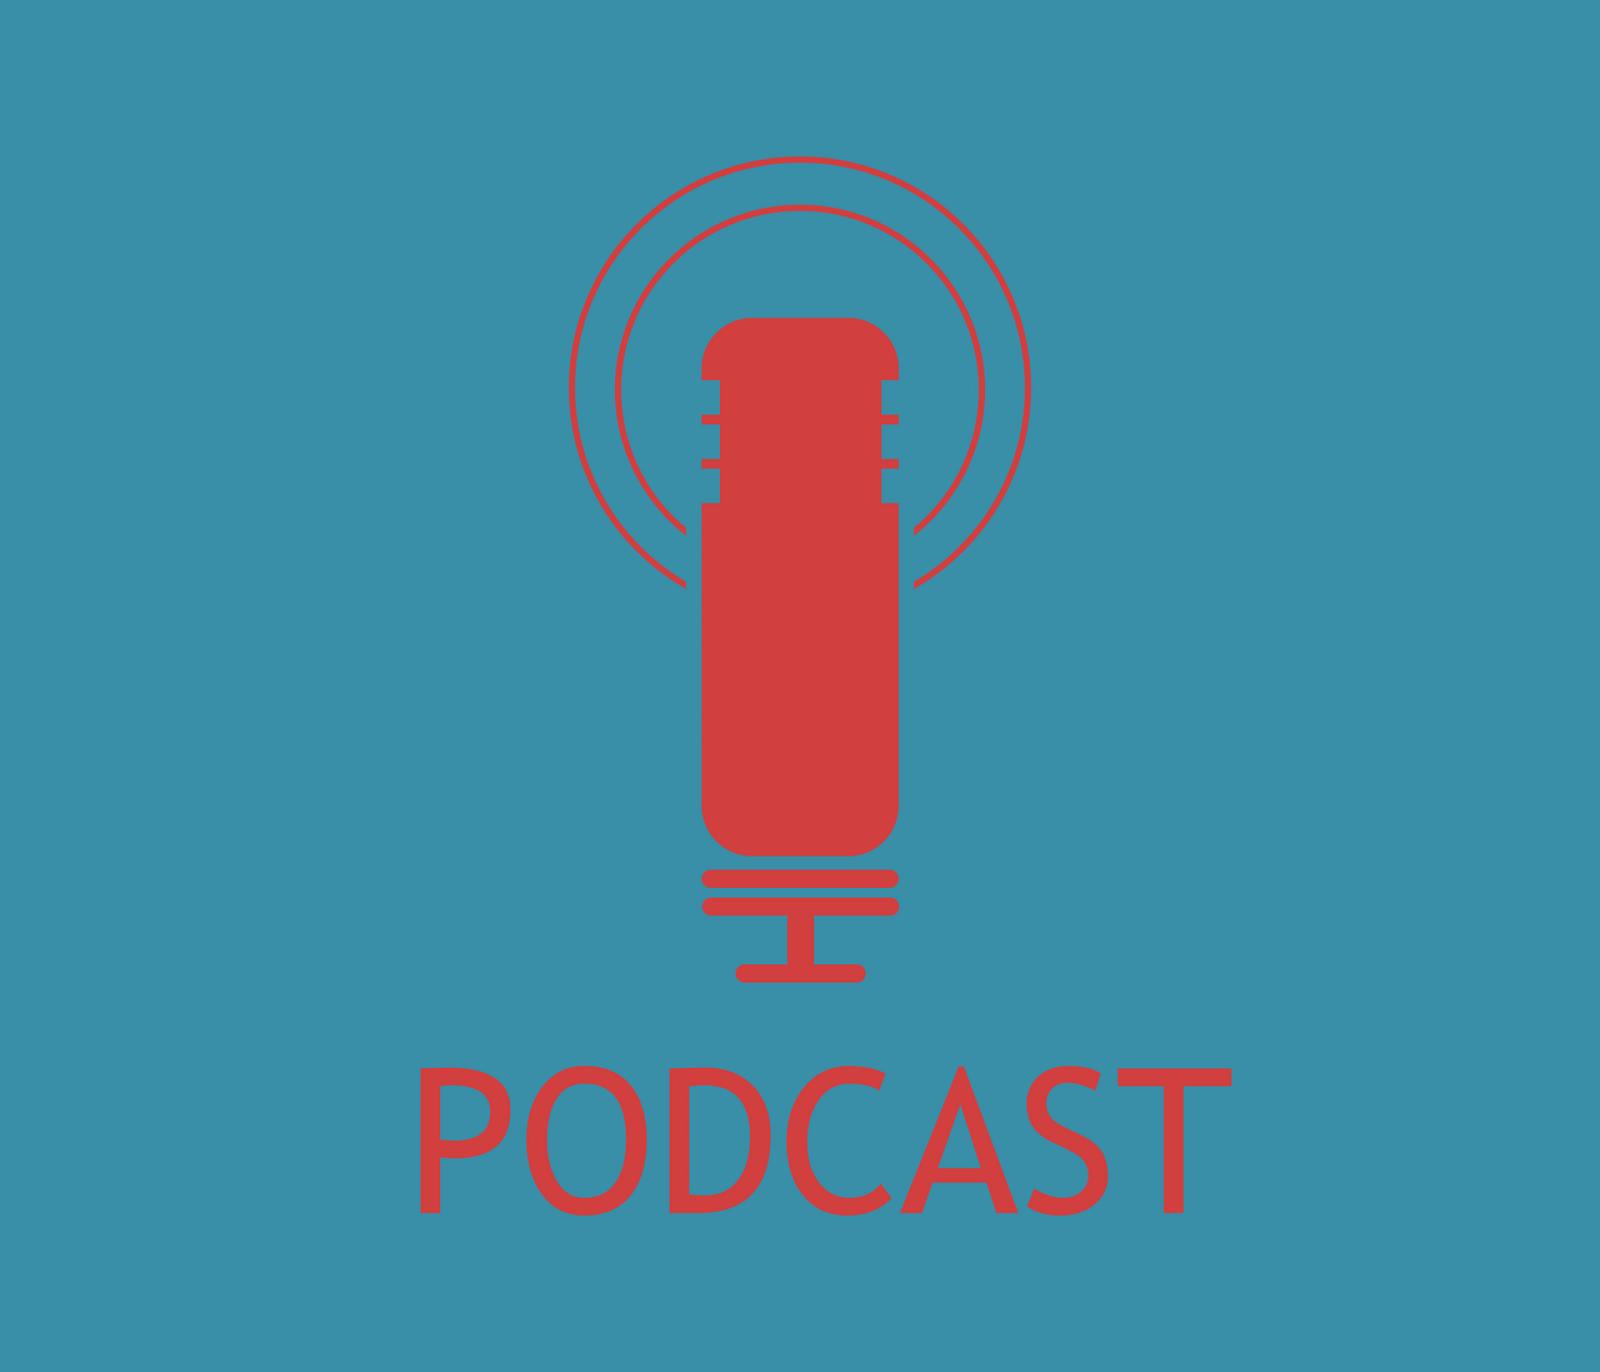 Ondas del ayer - 'Objetivo podcast' - 07/12/20 - Escuchar ahora